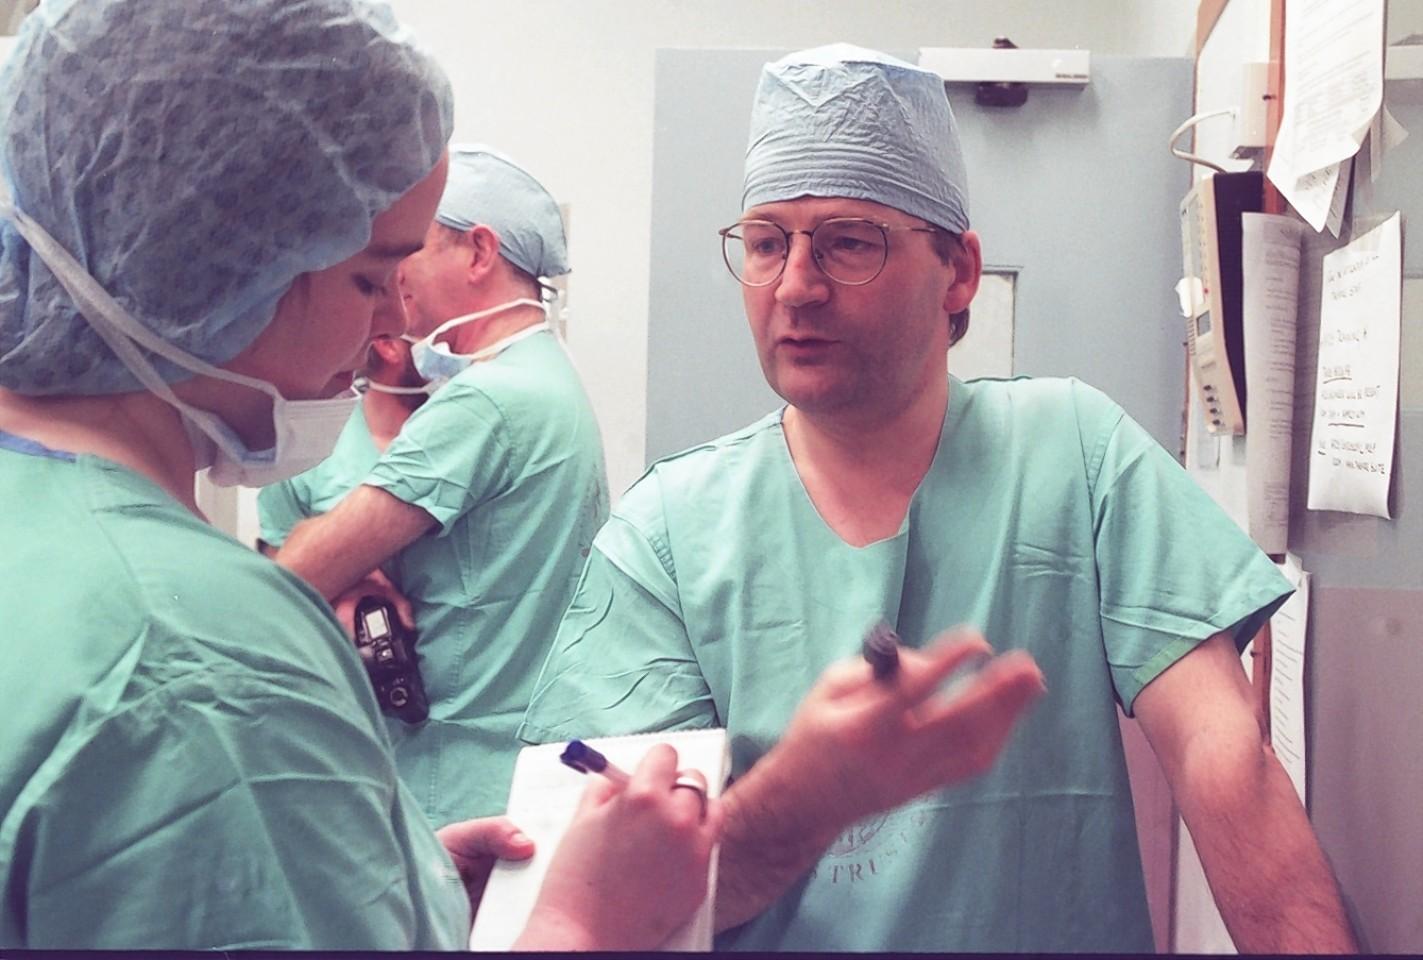 Surgeon Zygmunt Krukowski